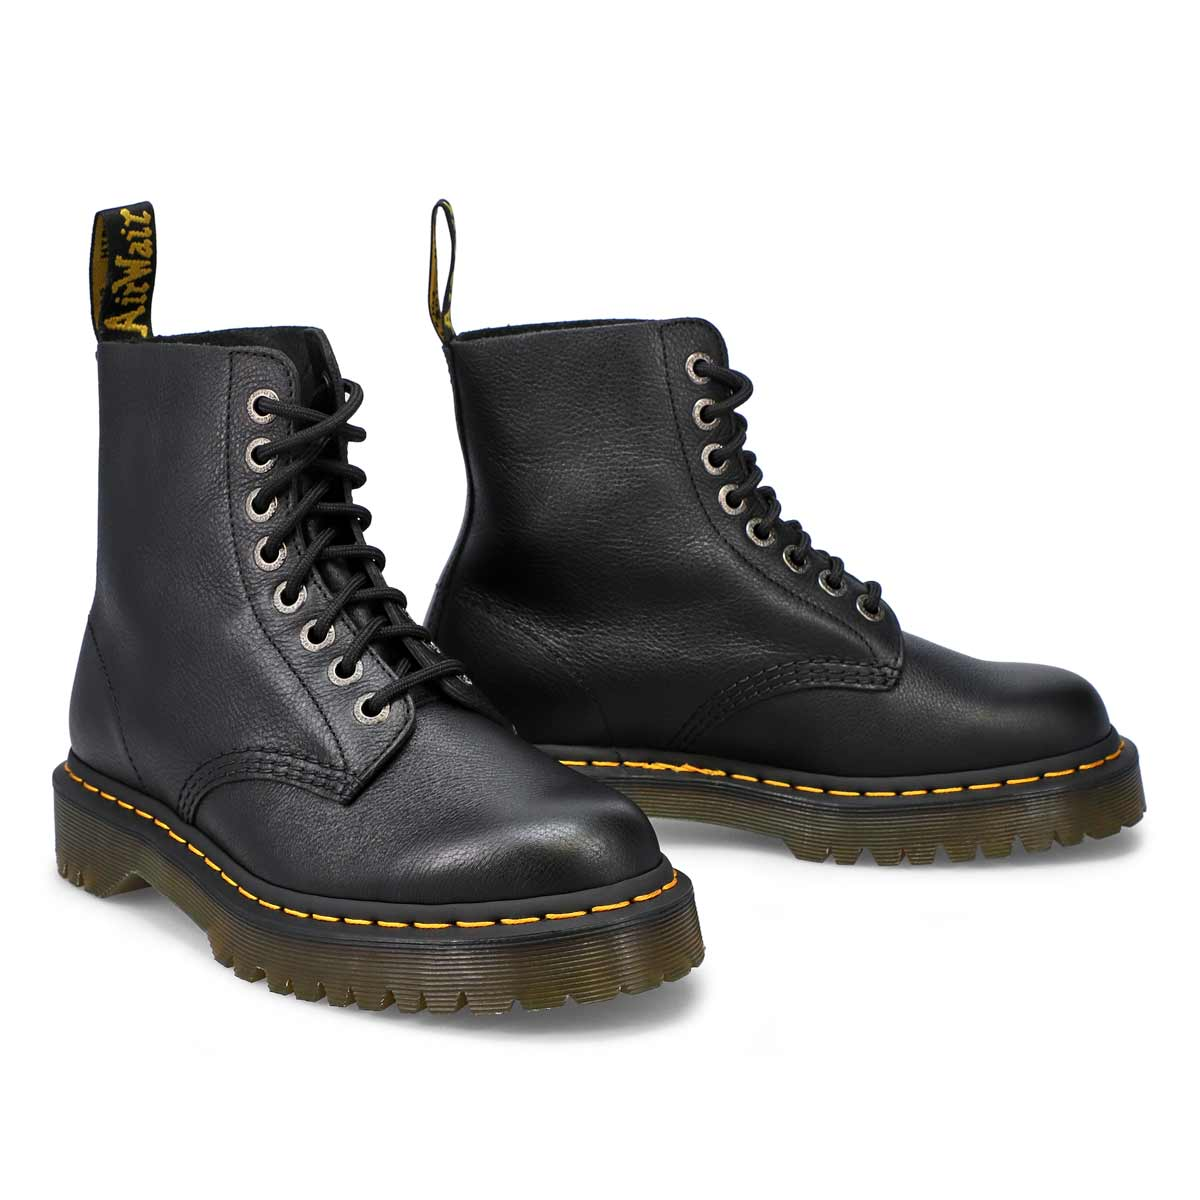 Women's 1460 Pascal Bex Boots - Black